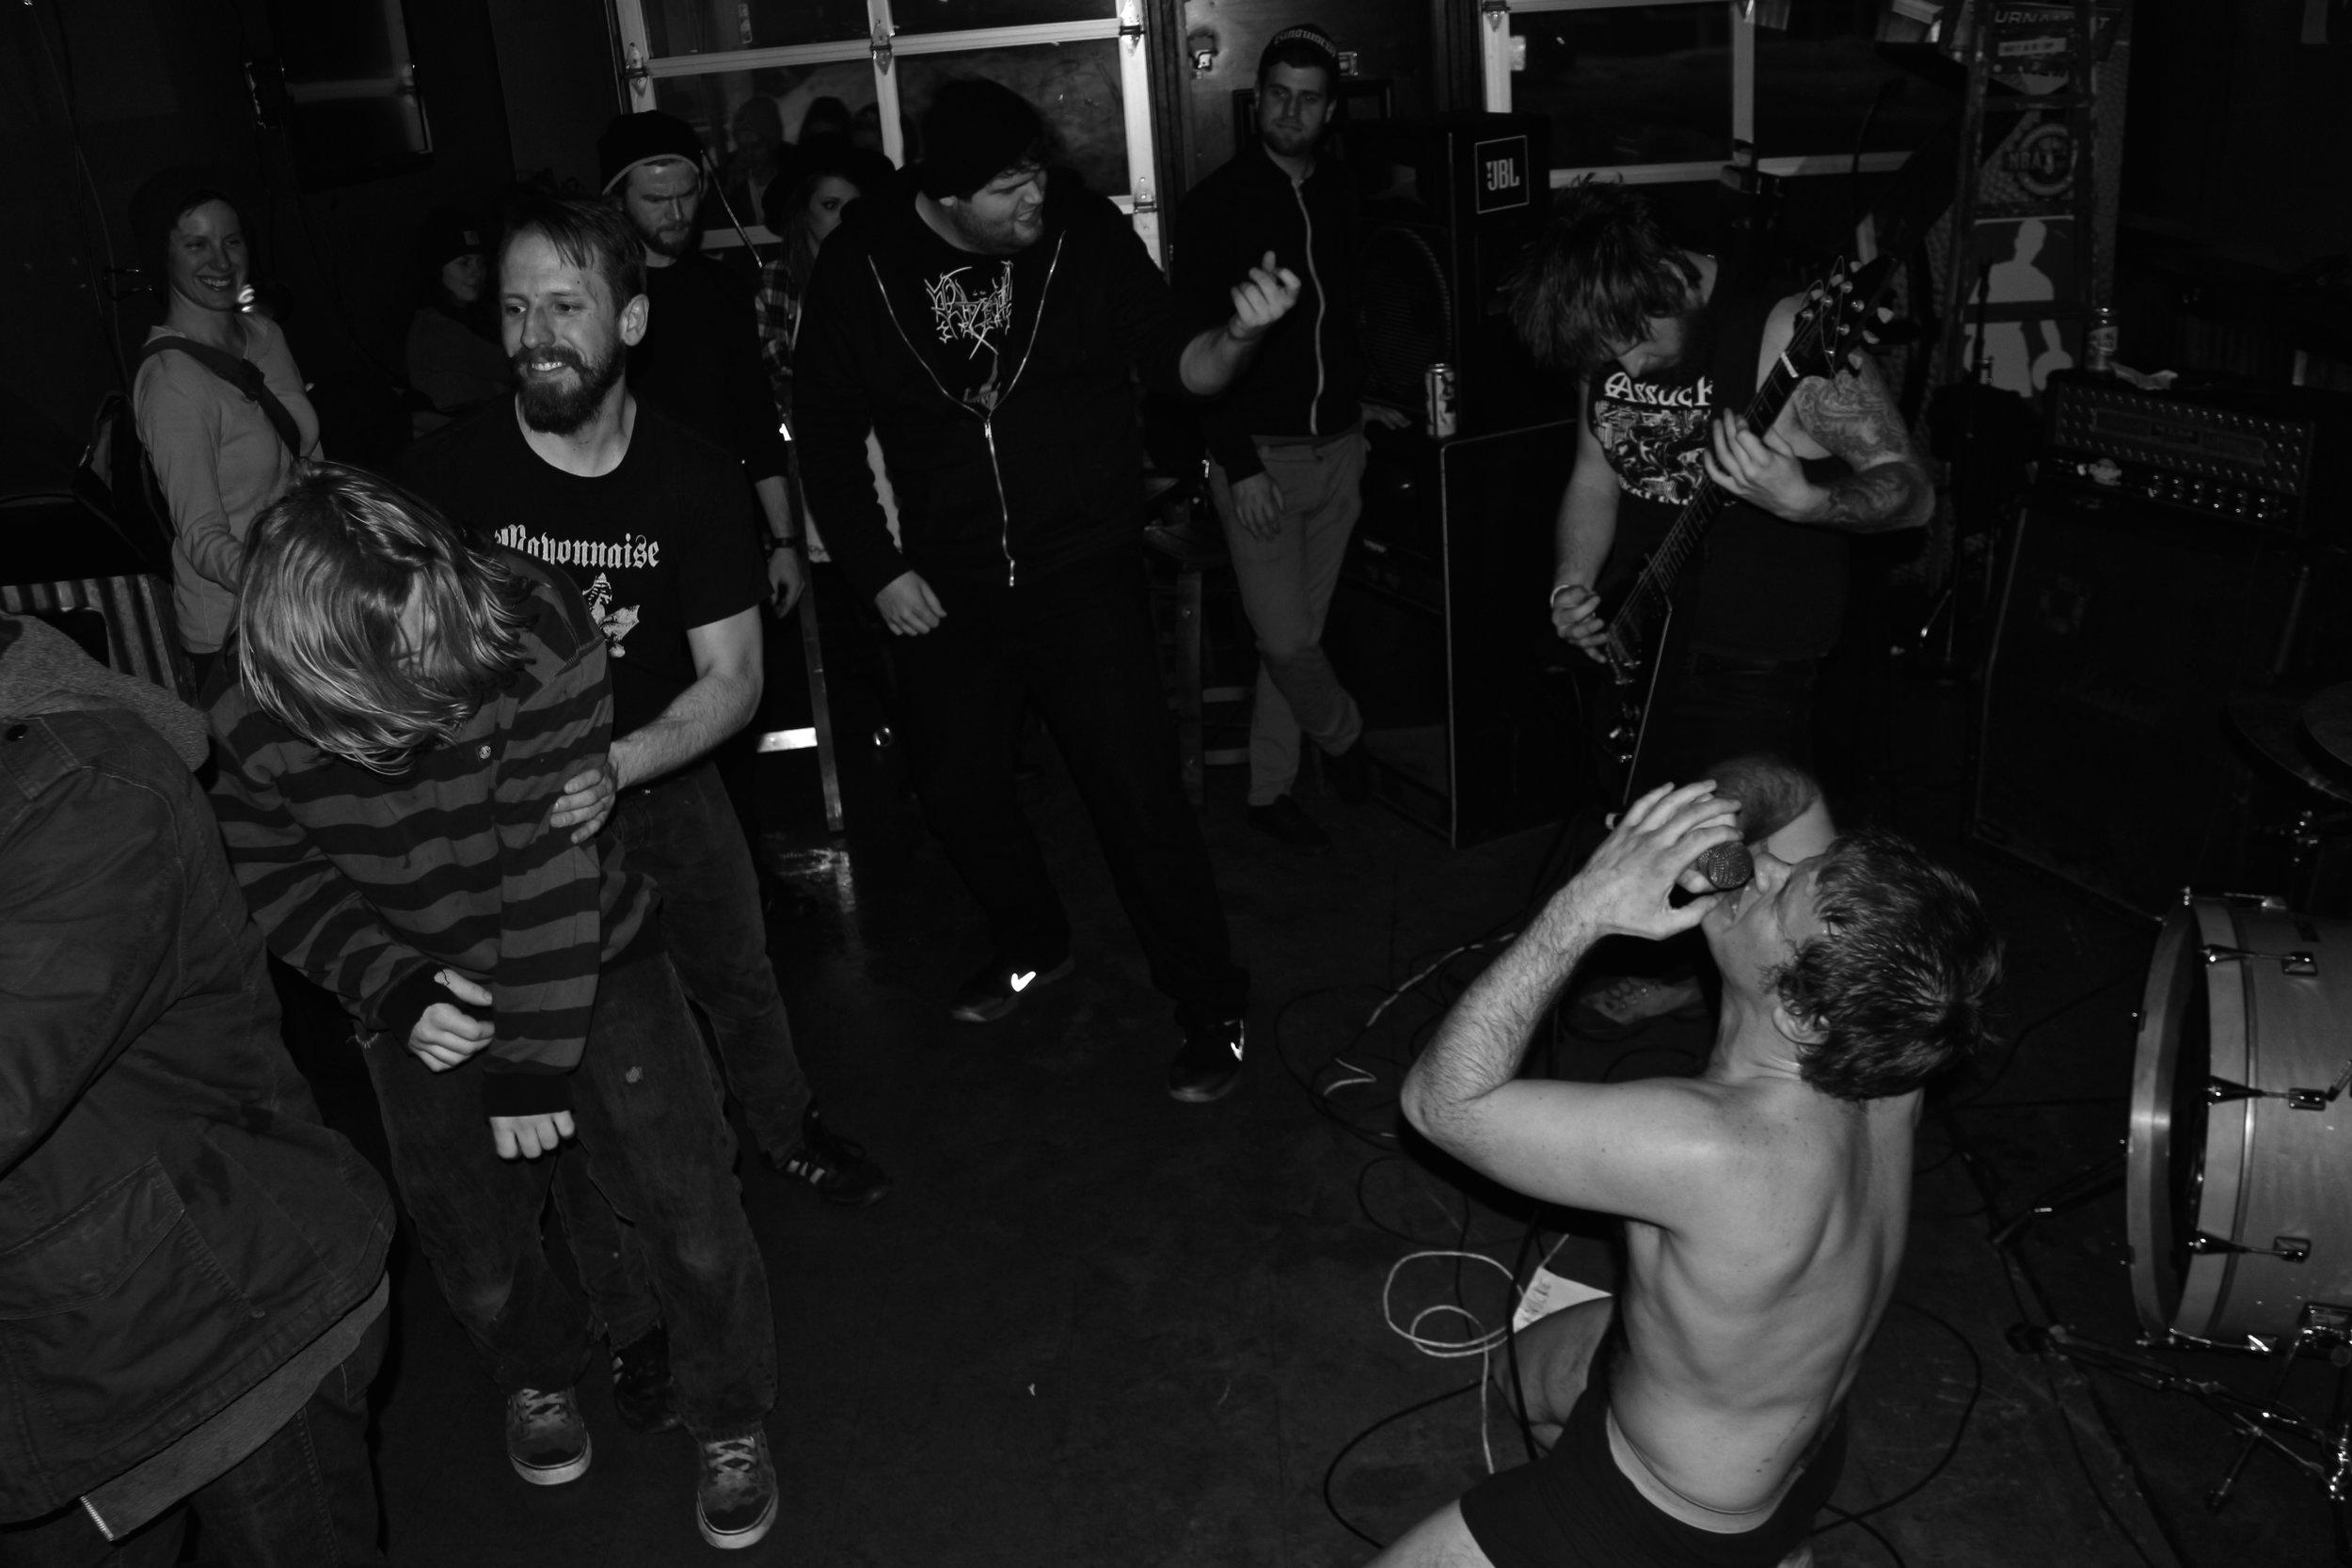 NerdRage. Best Friend Bar, Lexington, KY. 2015.